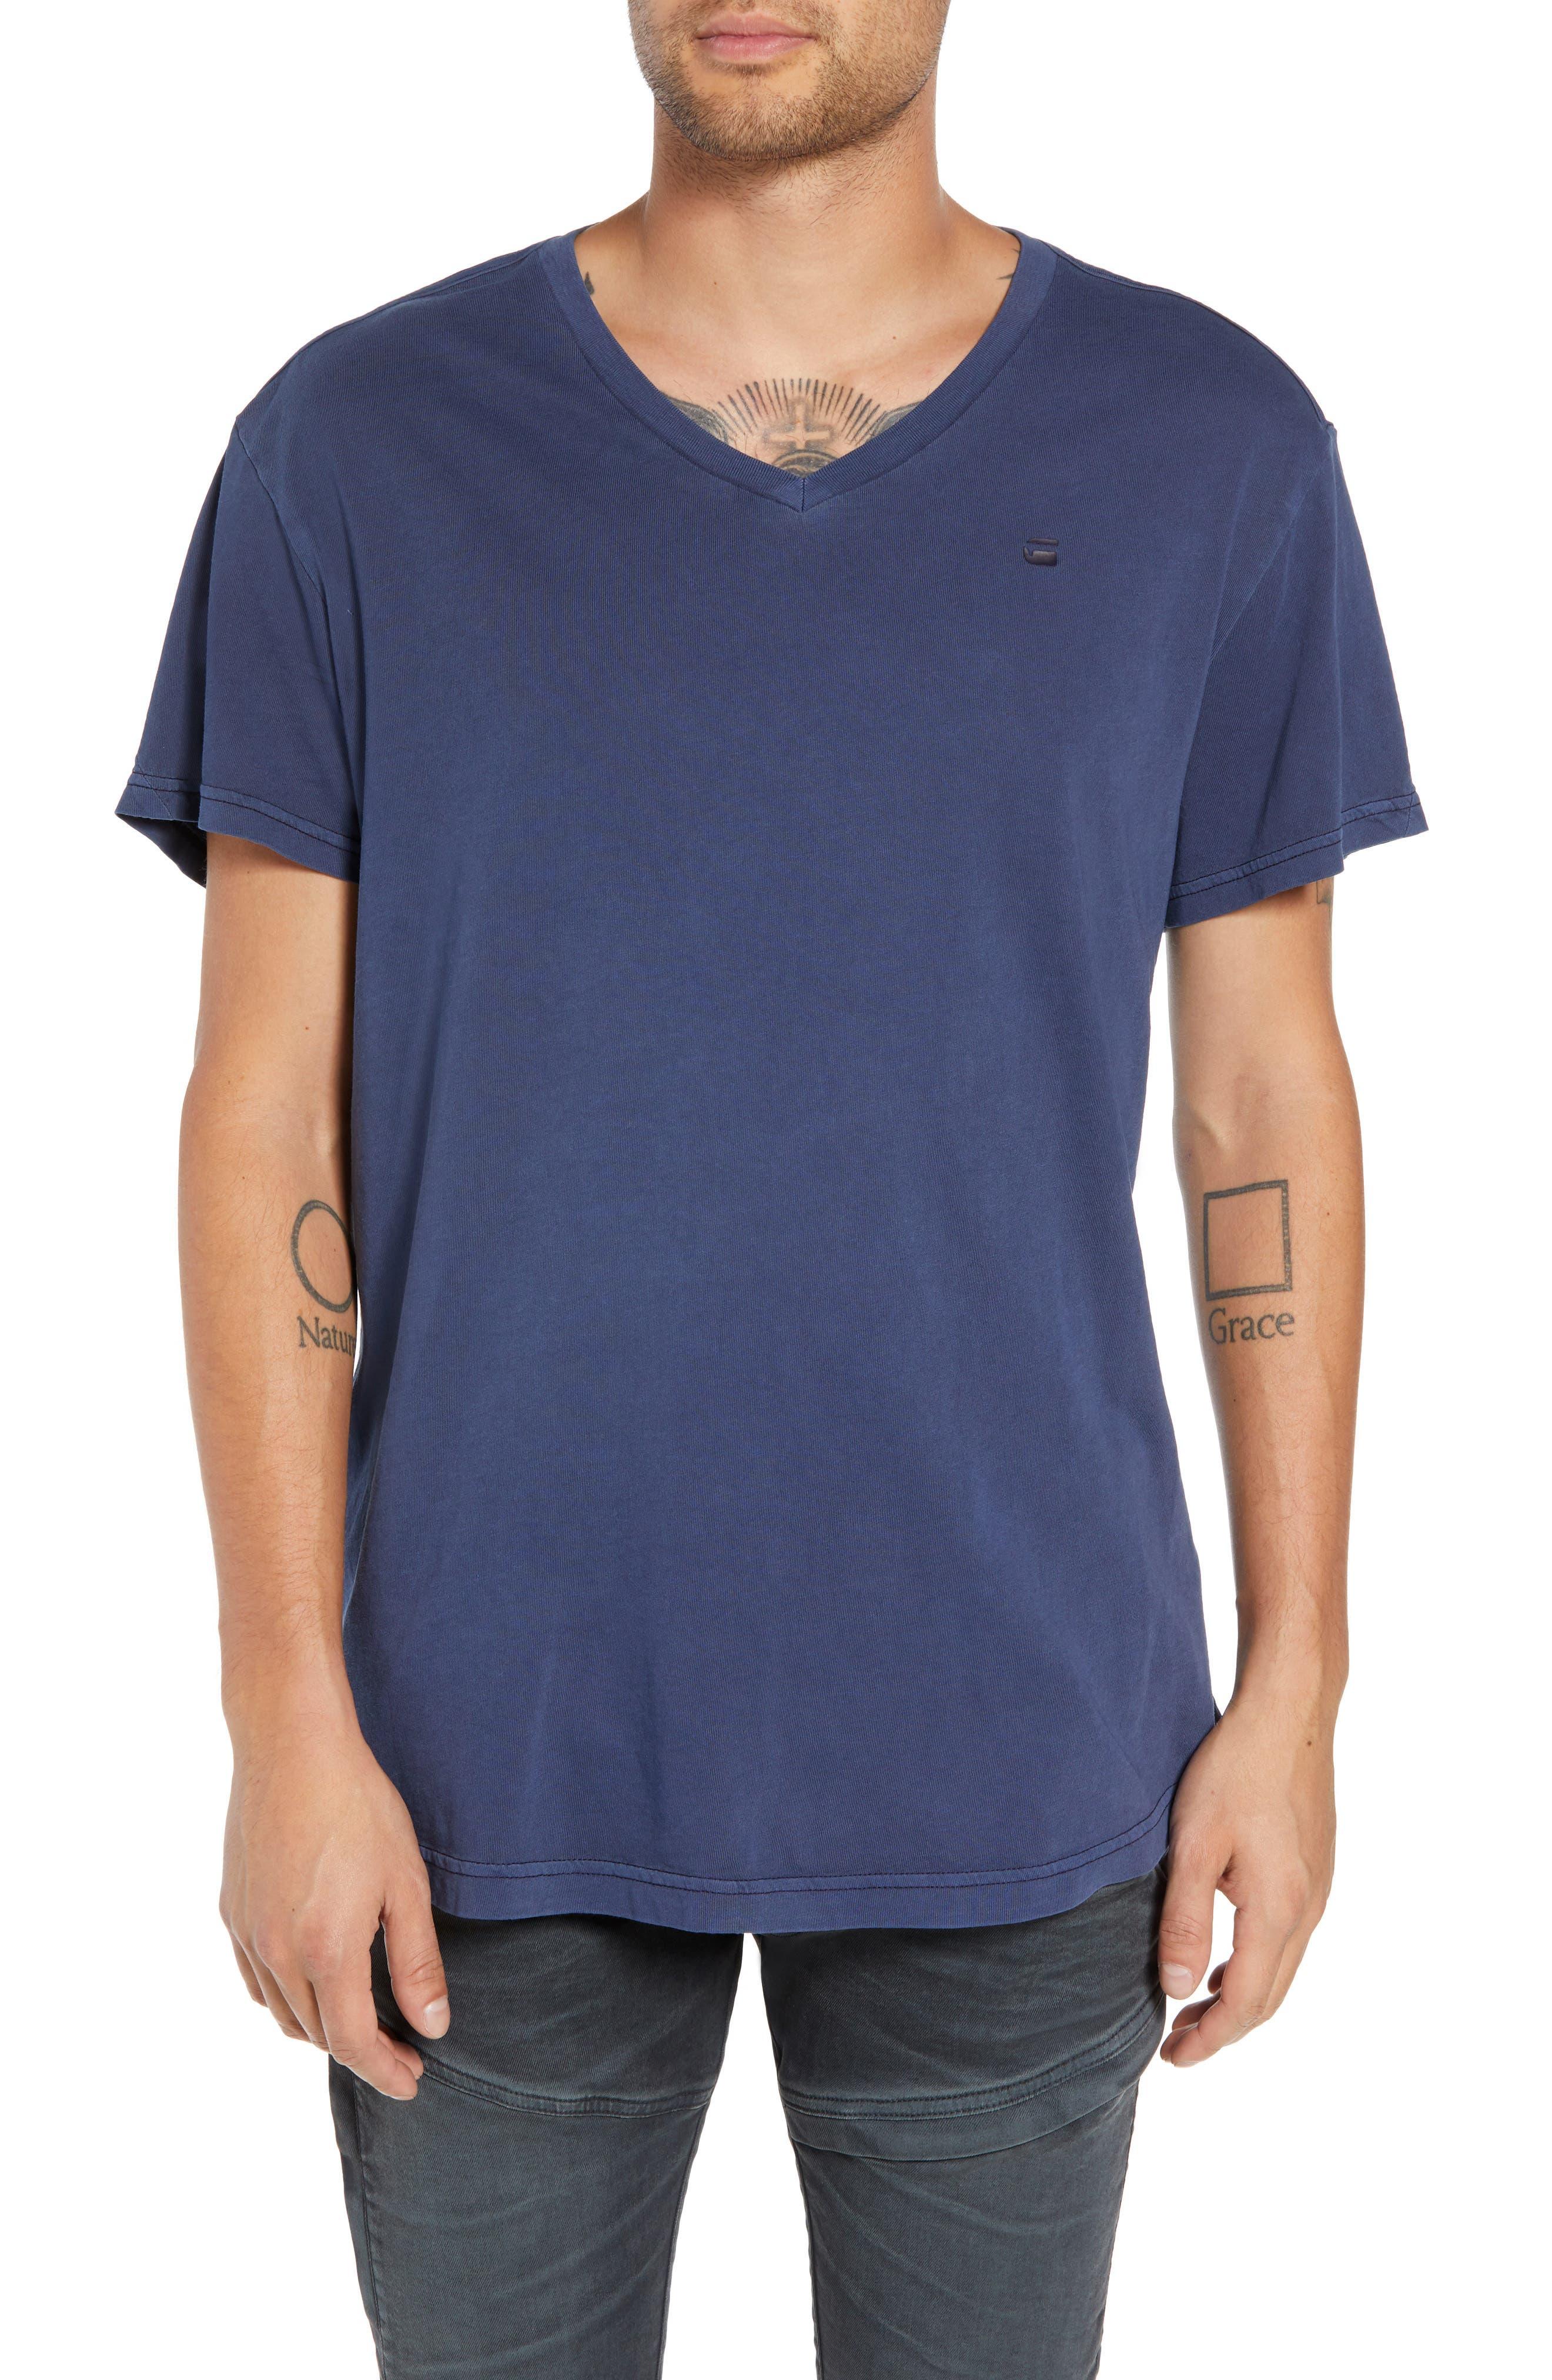 G-STAR RAW Starkton Solid V-Neck T-Shirt in Sartho Blue